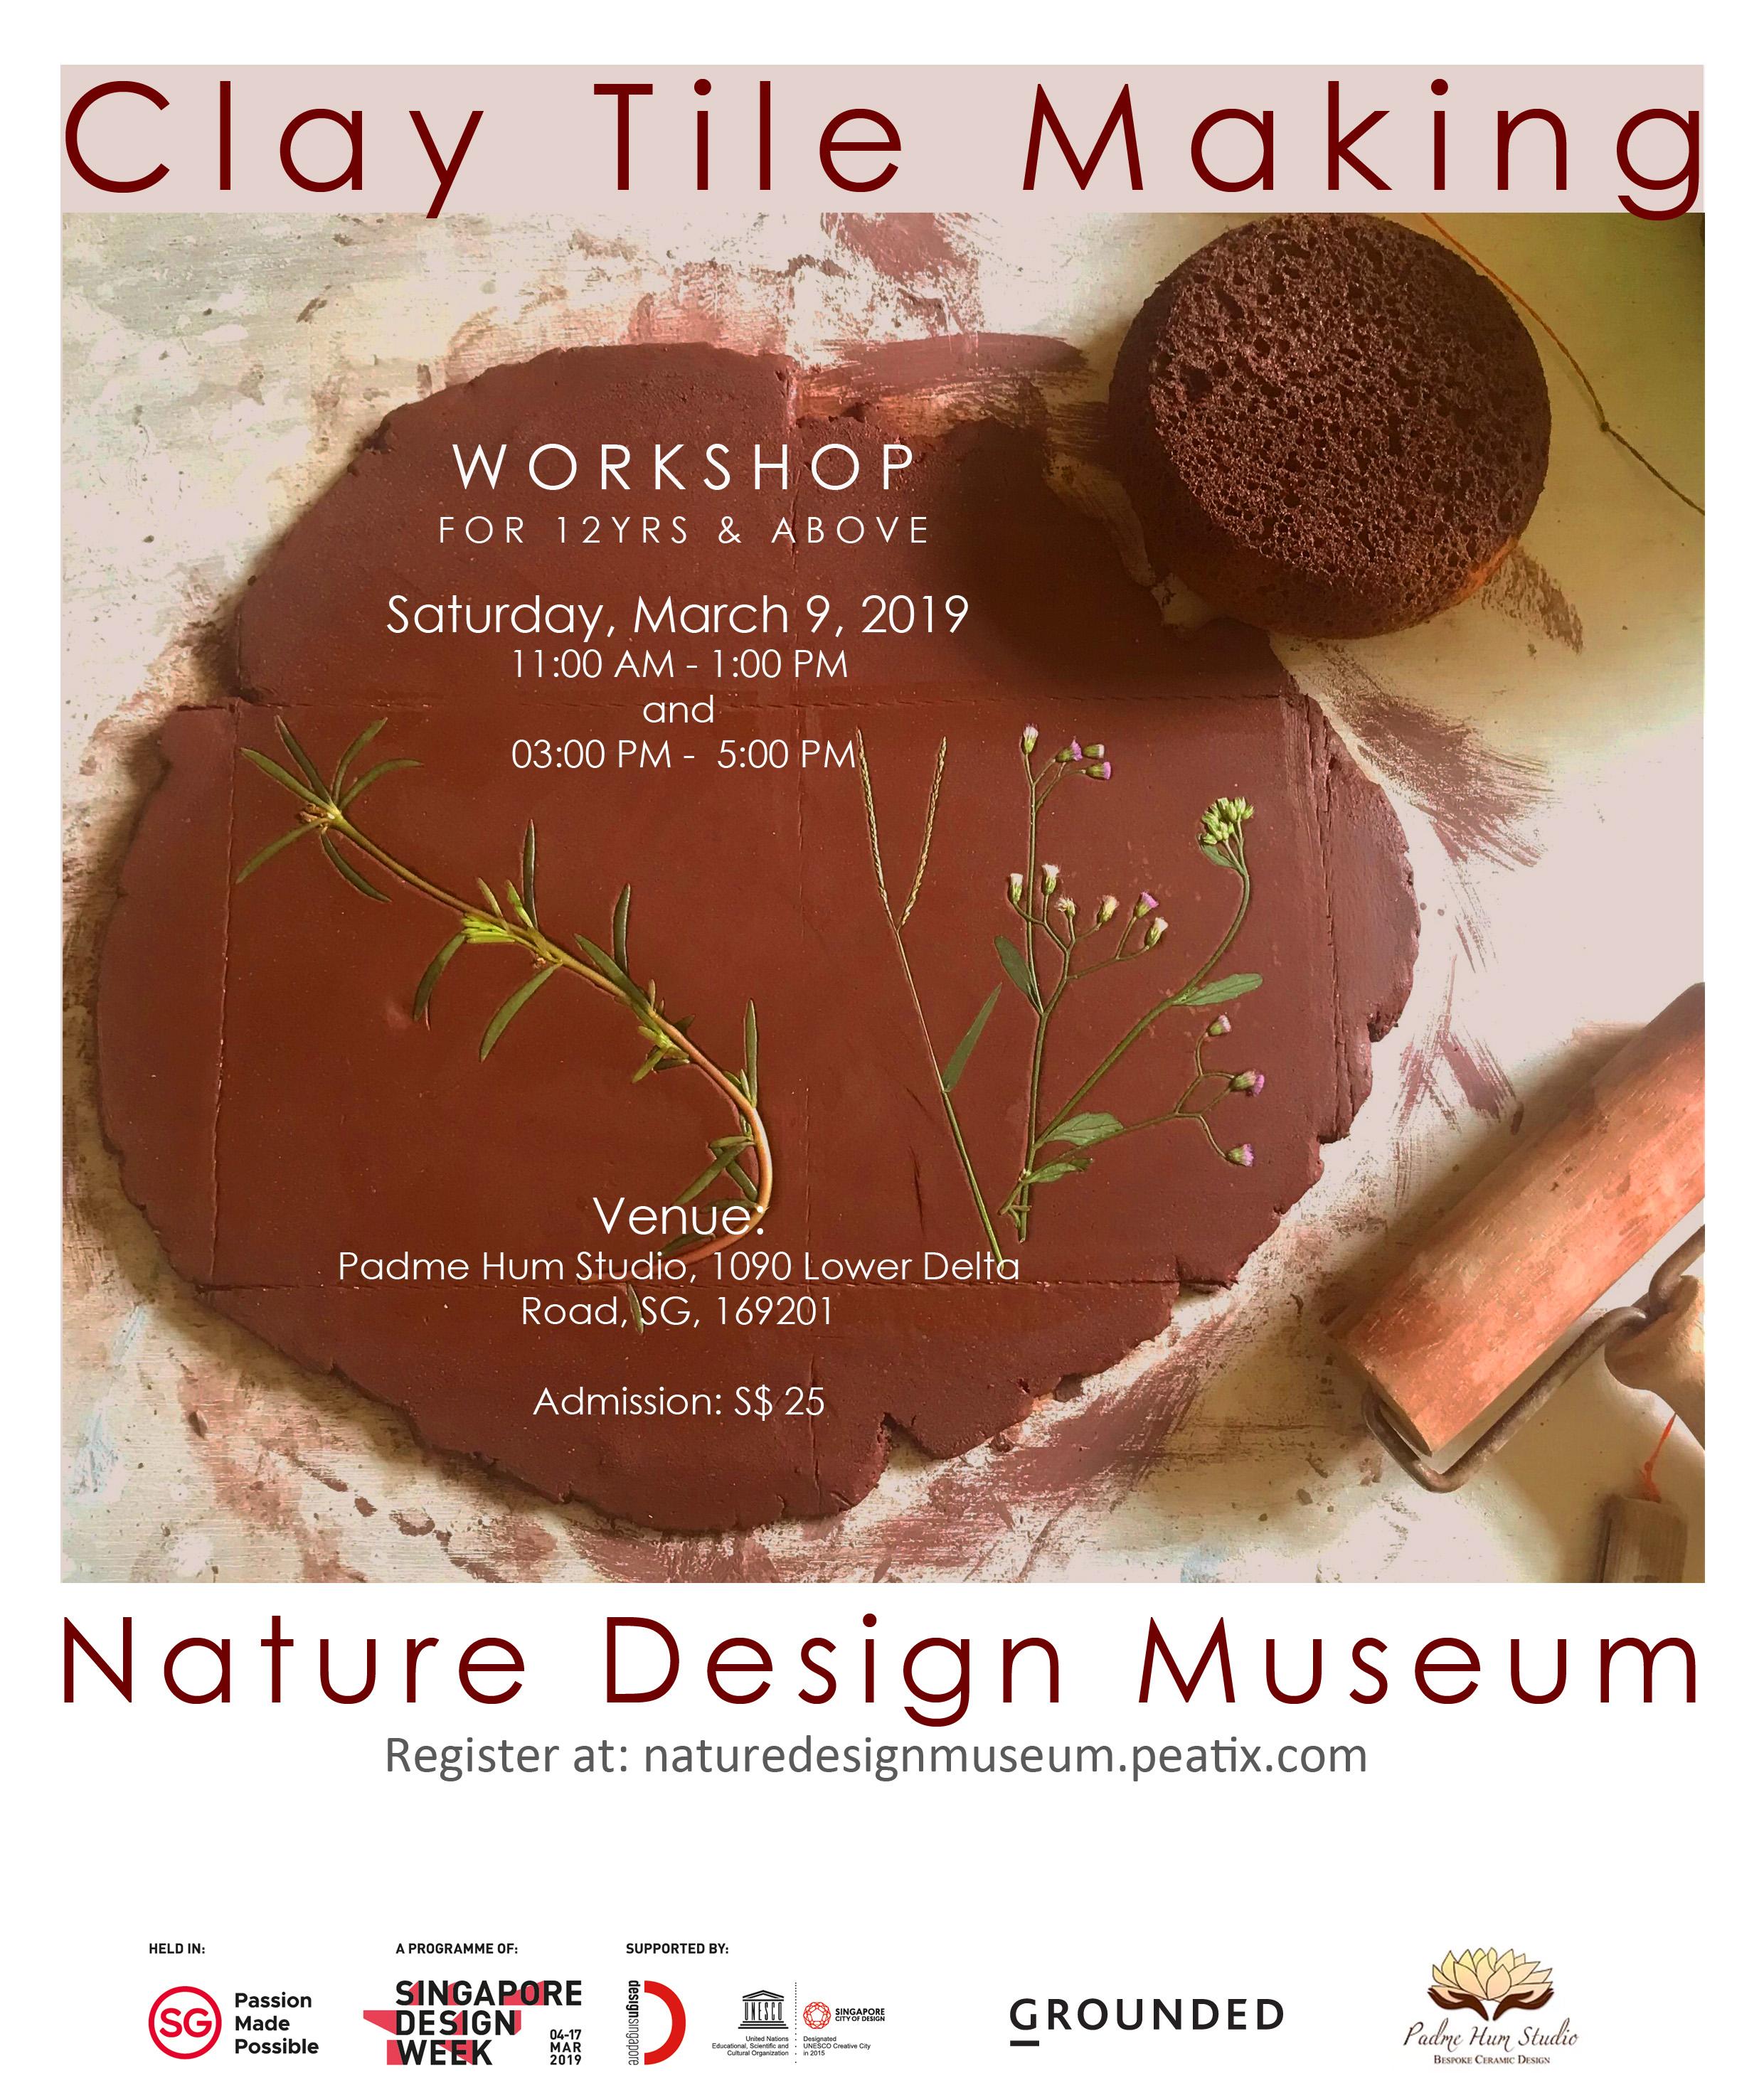 Clay Tile Workshop Flyer.jpg